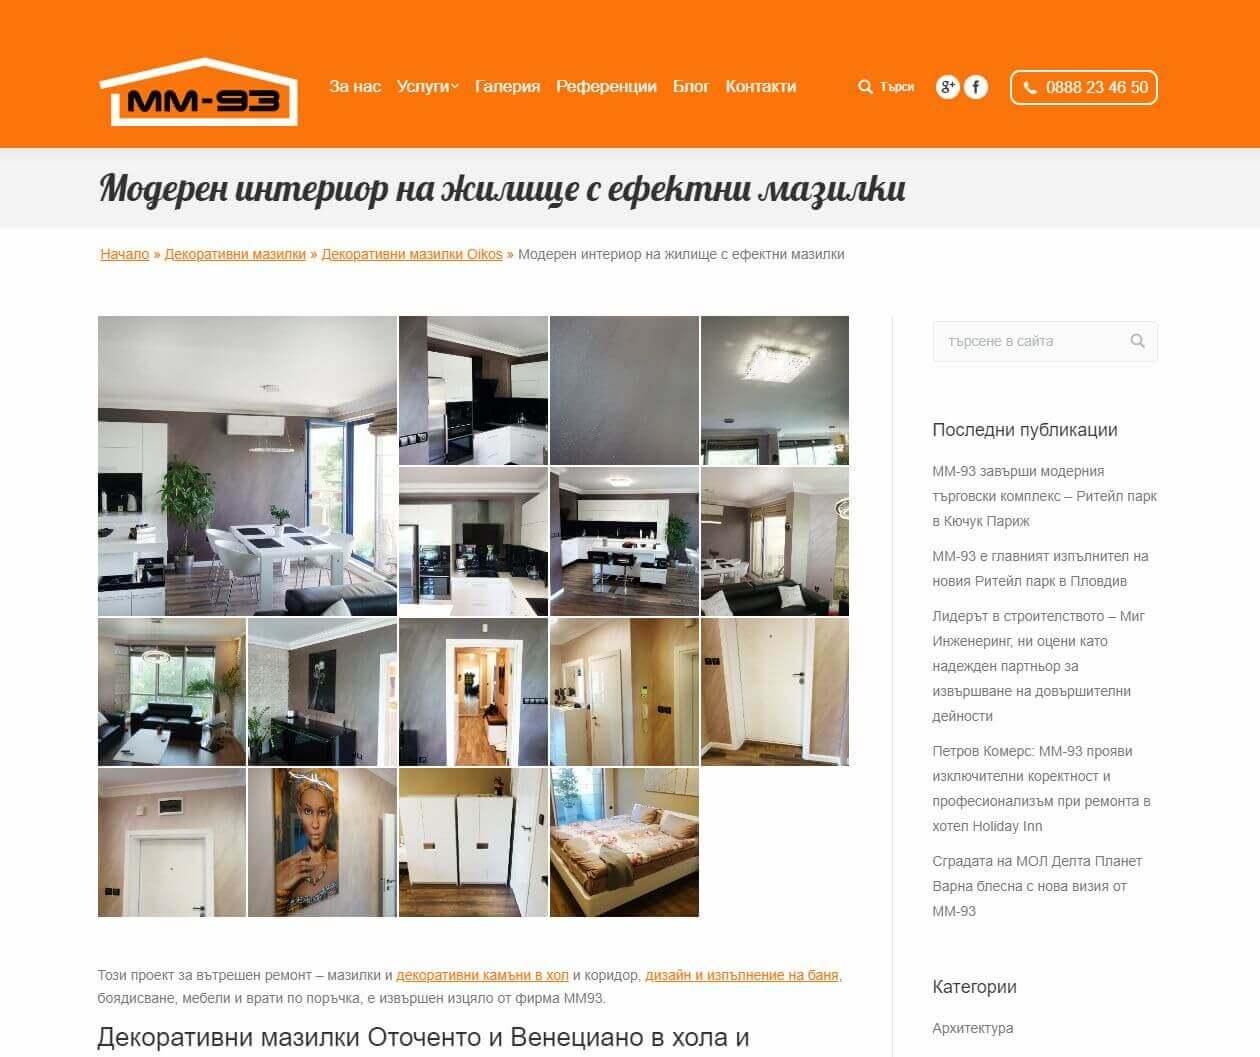 Интерактивен, респонсив уеб дизайн - Медия Дизайн